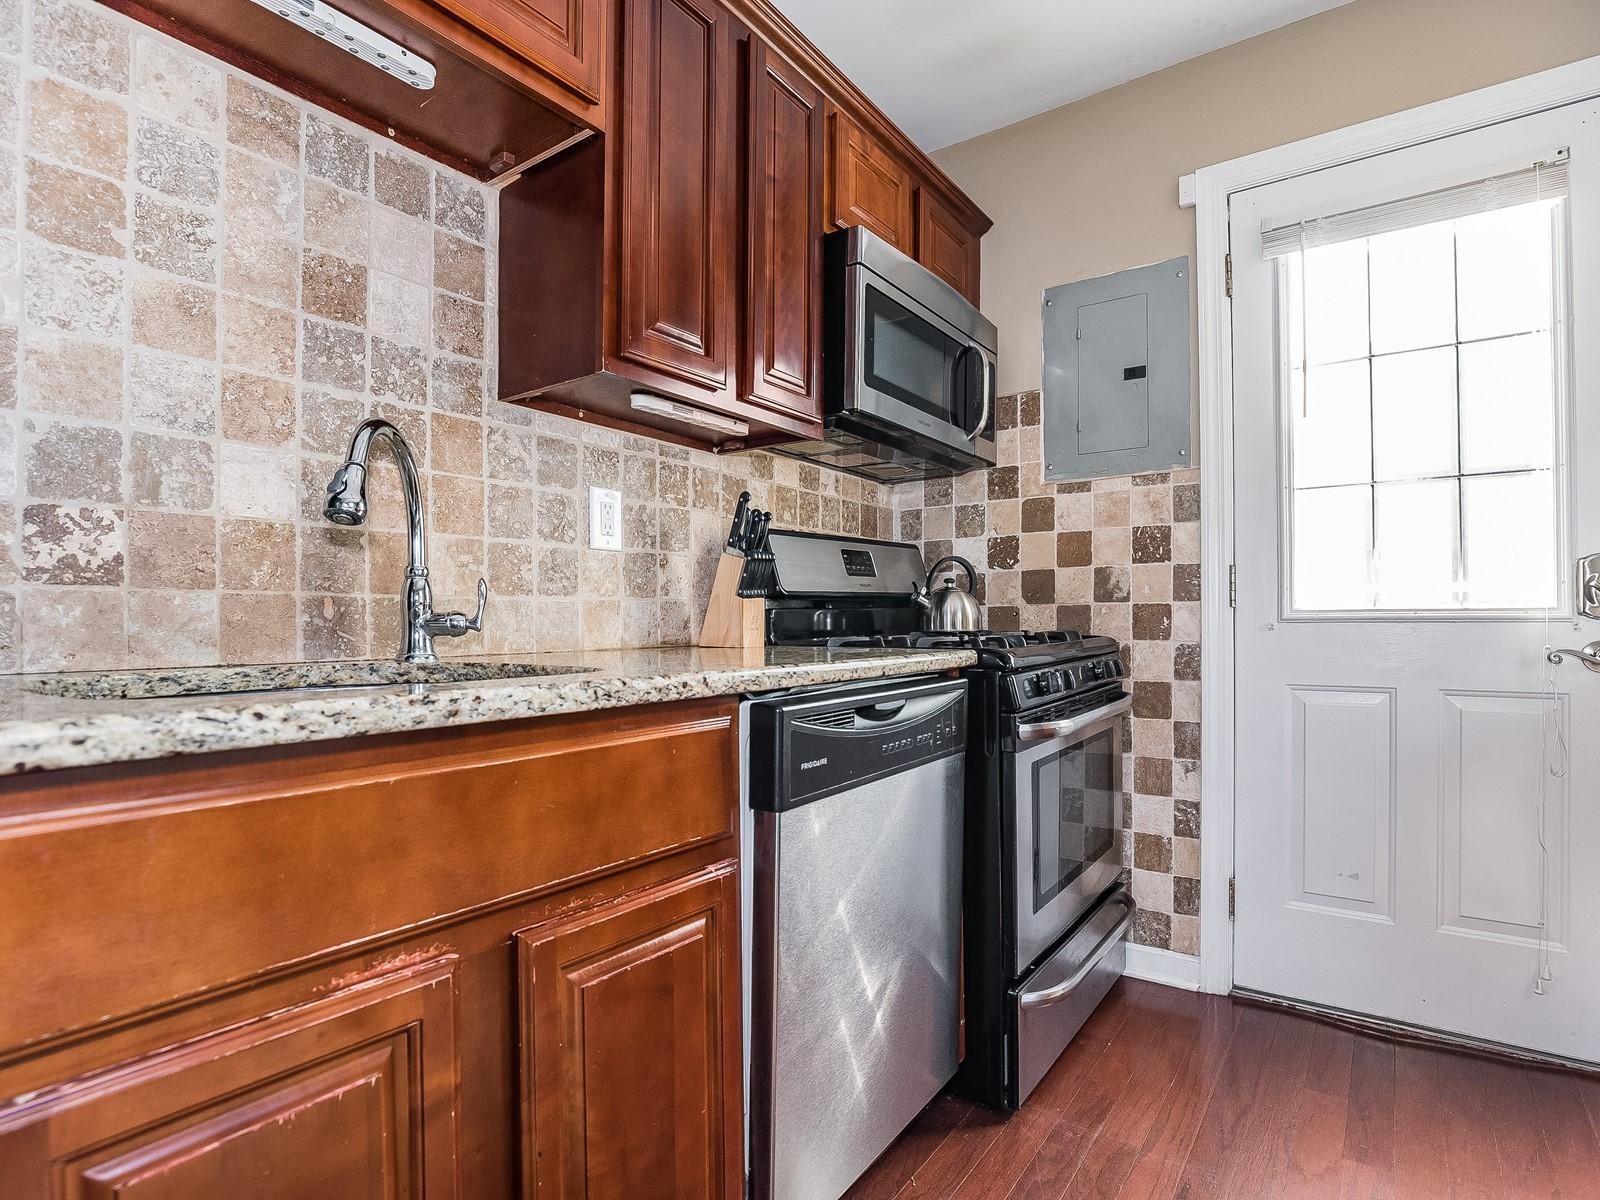 04-Furnished_Apartment_Edison_Kitchen2